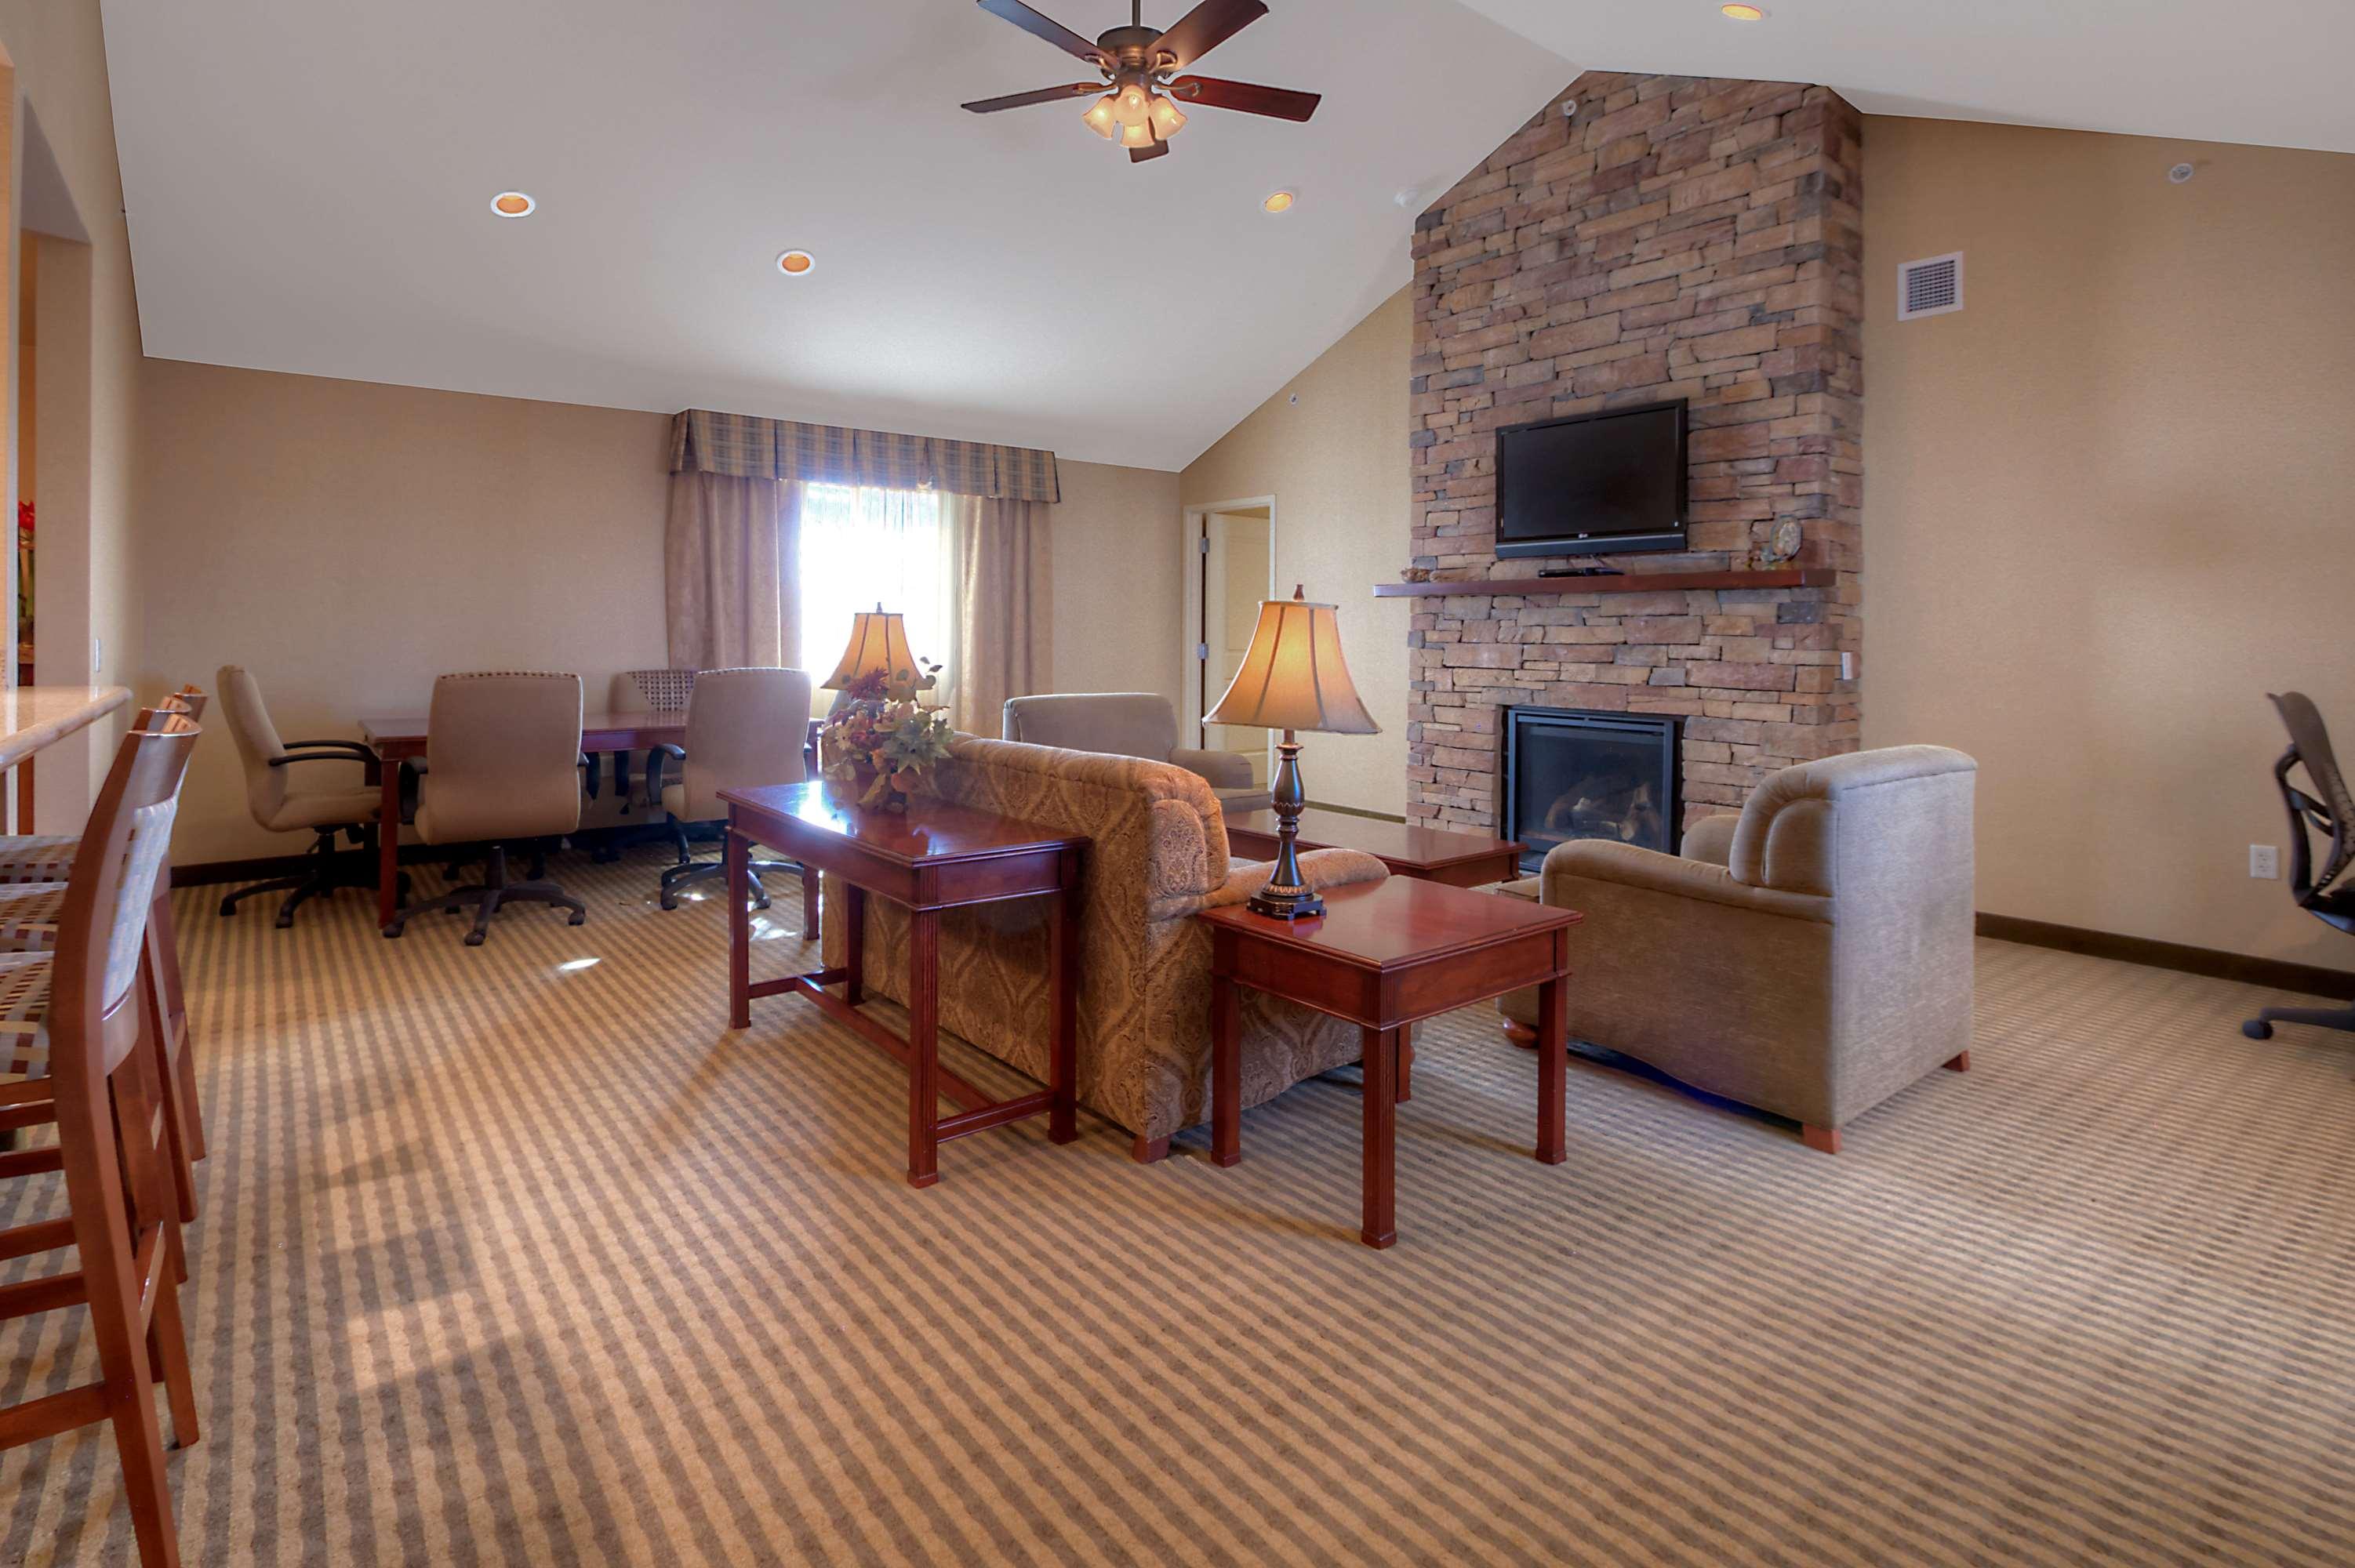 Hilton Garden Inn Great Falls image 20